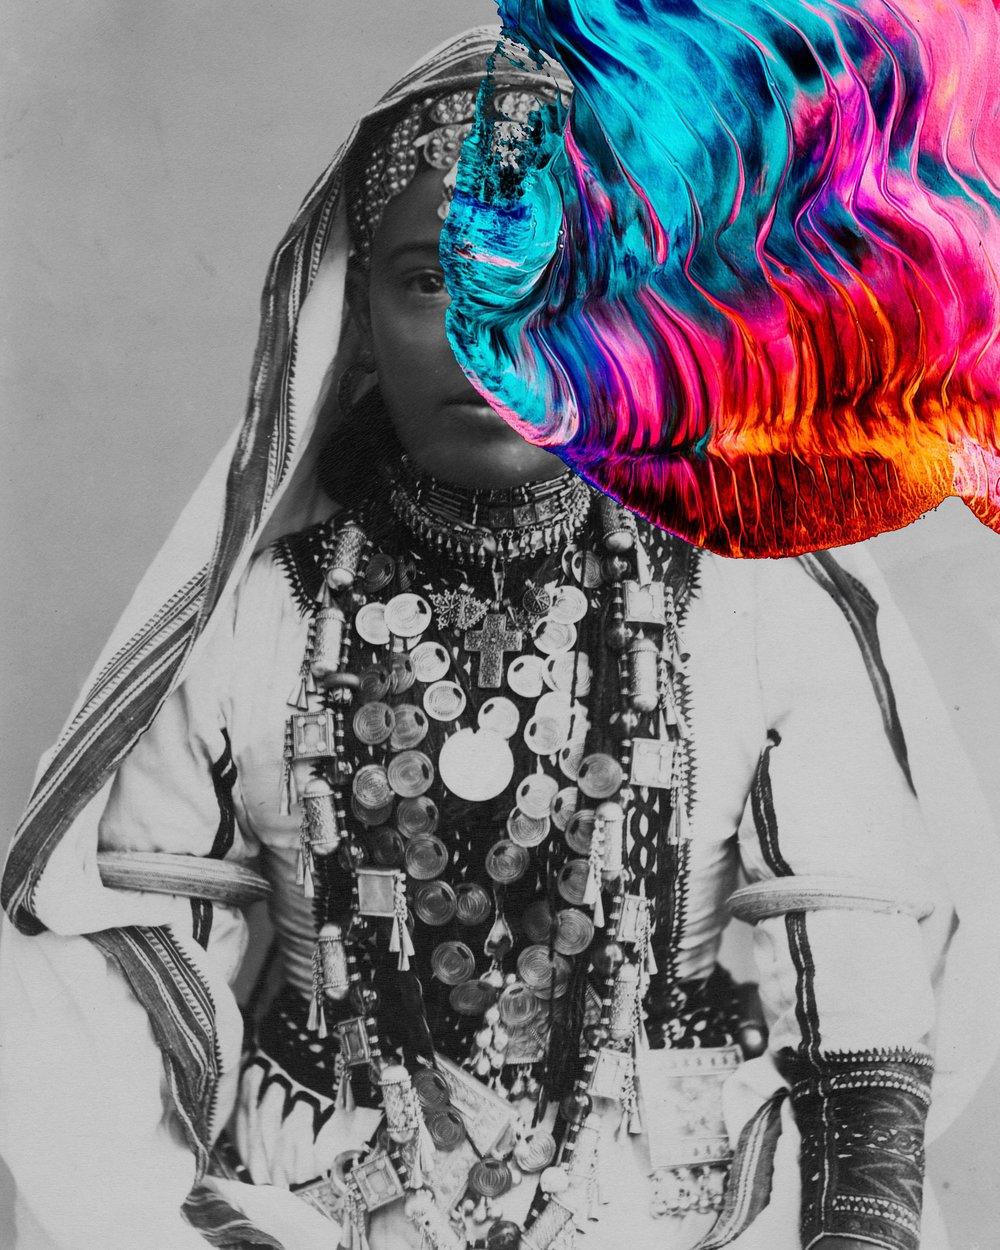 <b>Beya Khalifa</b></br><i>Scar Tissue II</i></br>Antique photograph and digital collage</br>Limited edition of 20</br>16 x 12 in